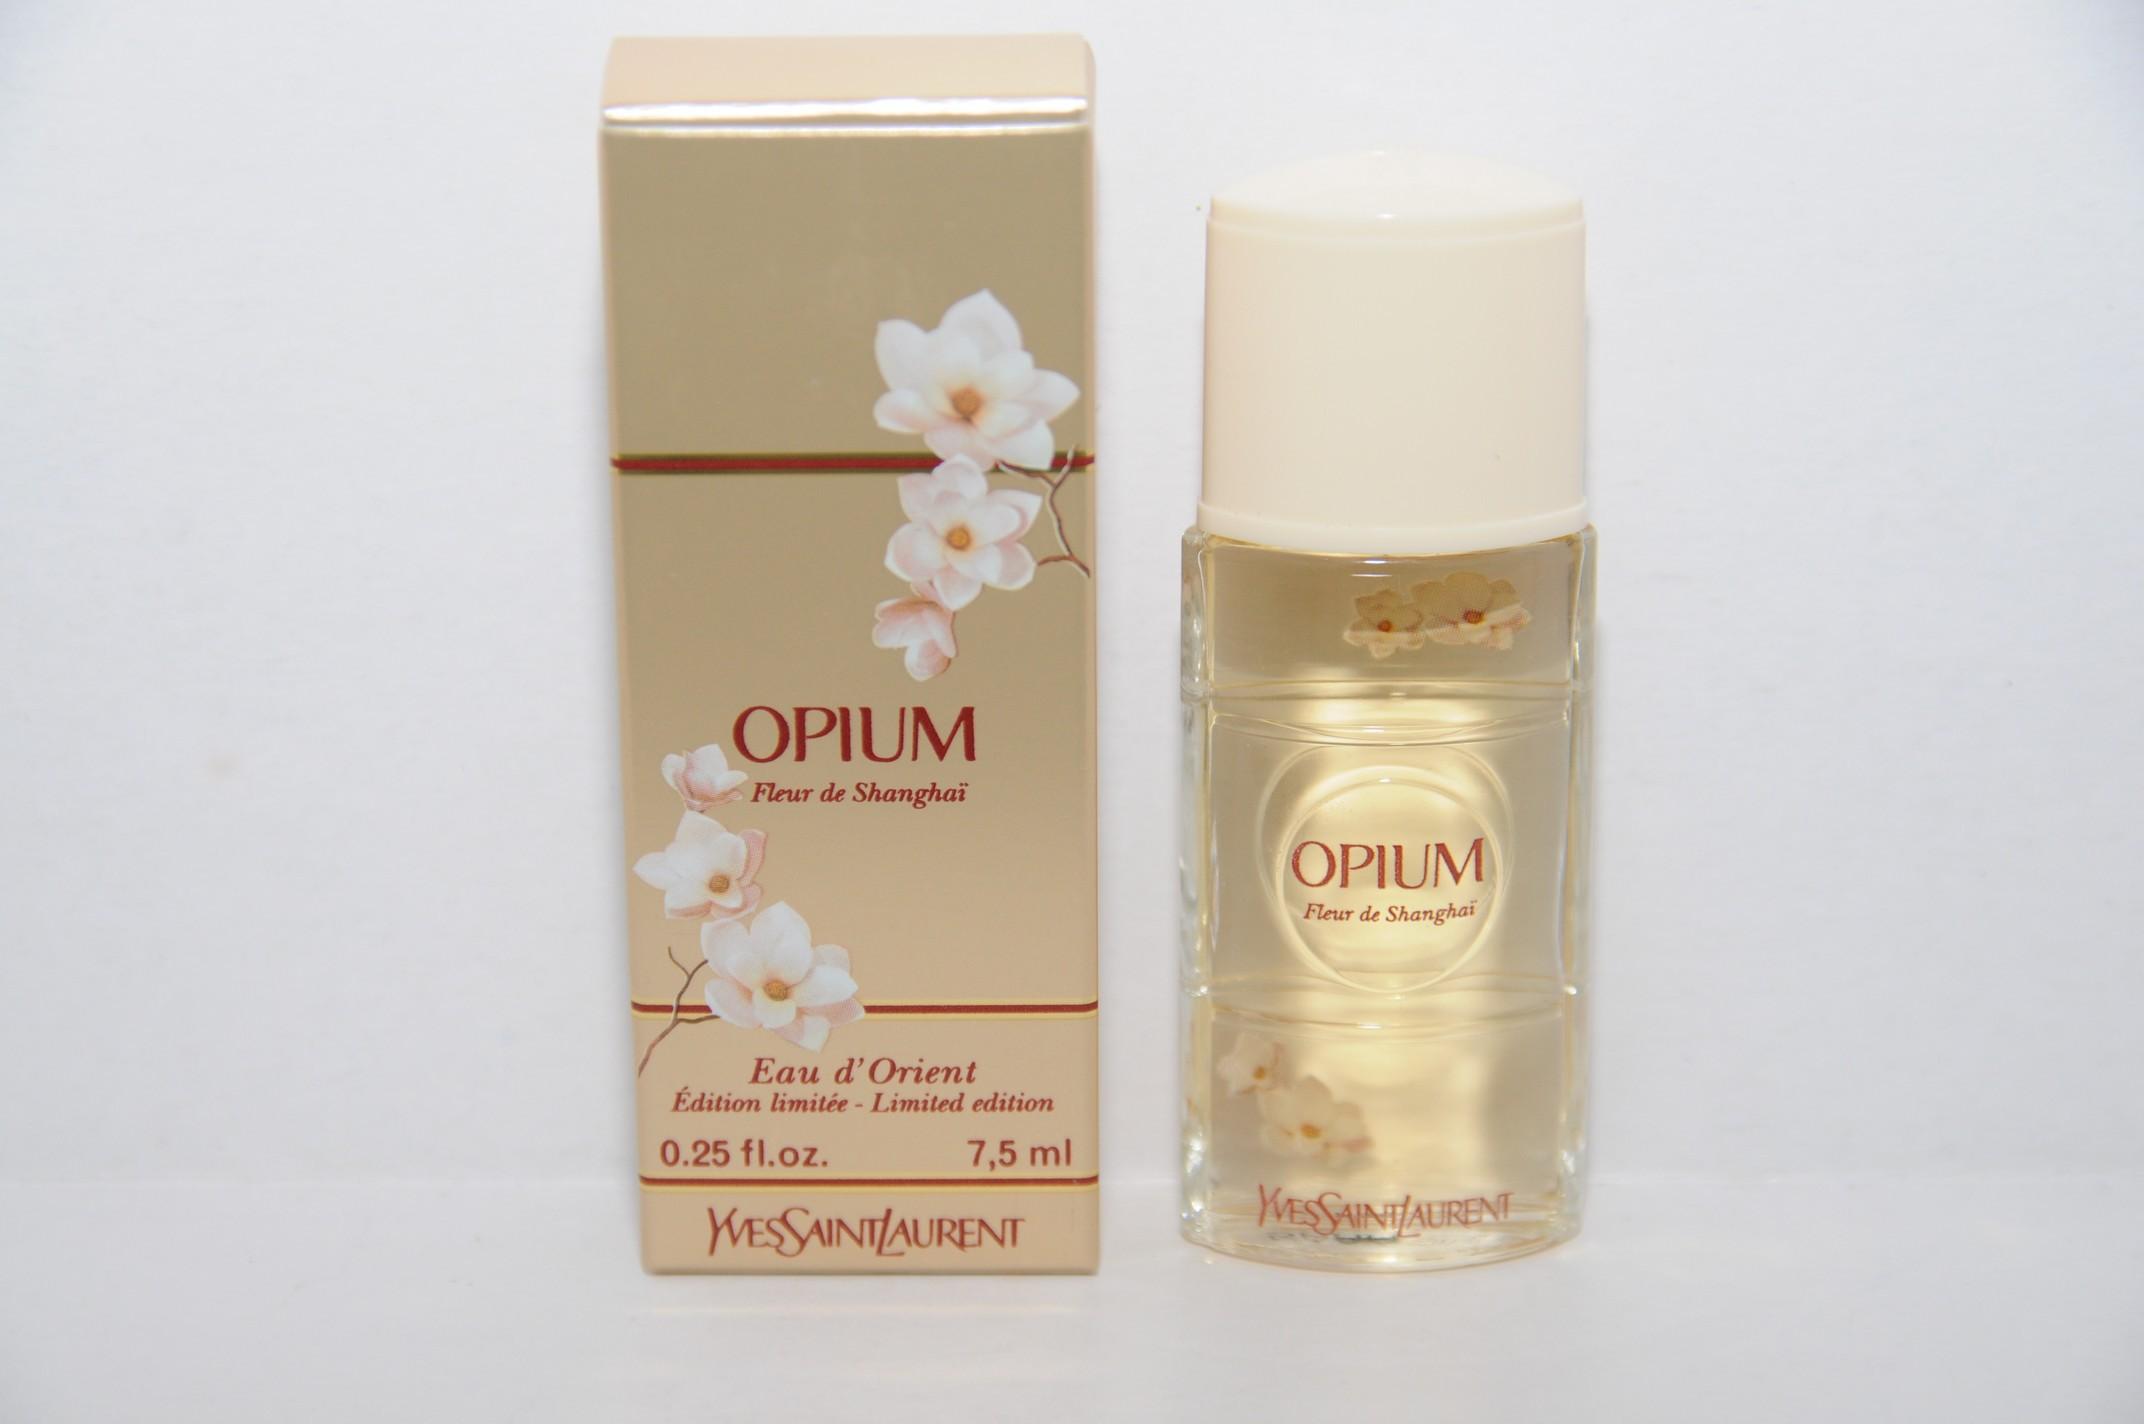 Yves Saint Laurent Opium Fleur De Shanghaï аромат для женщин